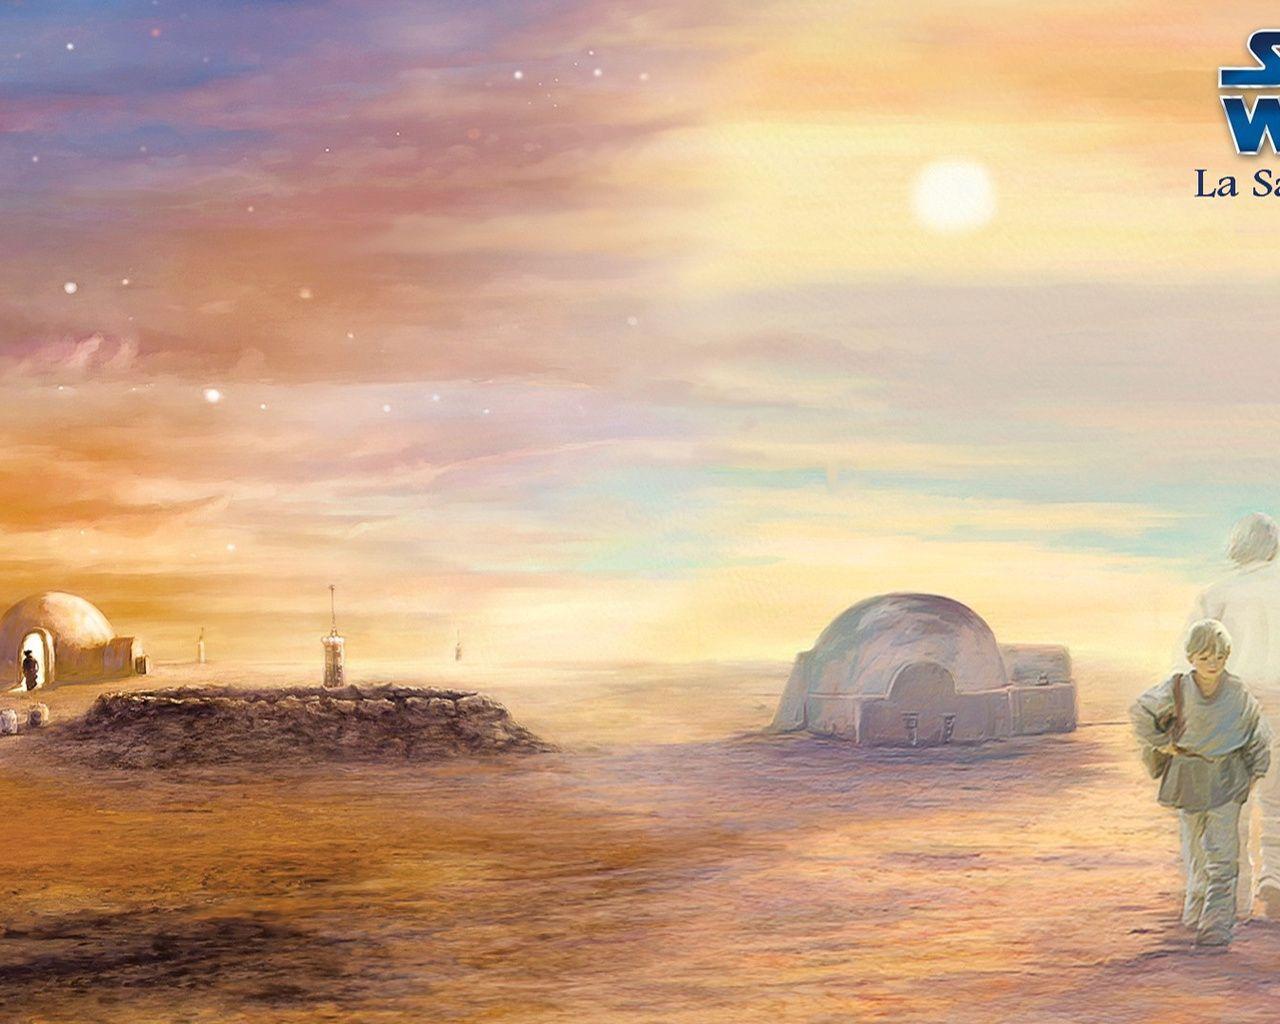 Tatooine Wallpapers Wallpaper Cave